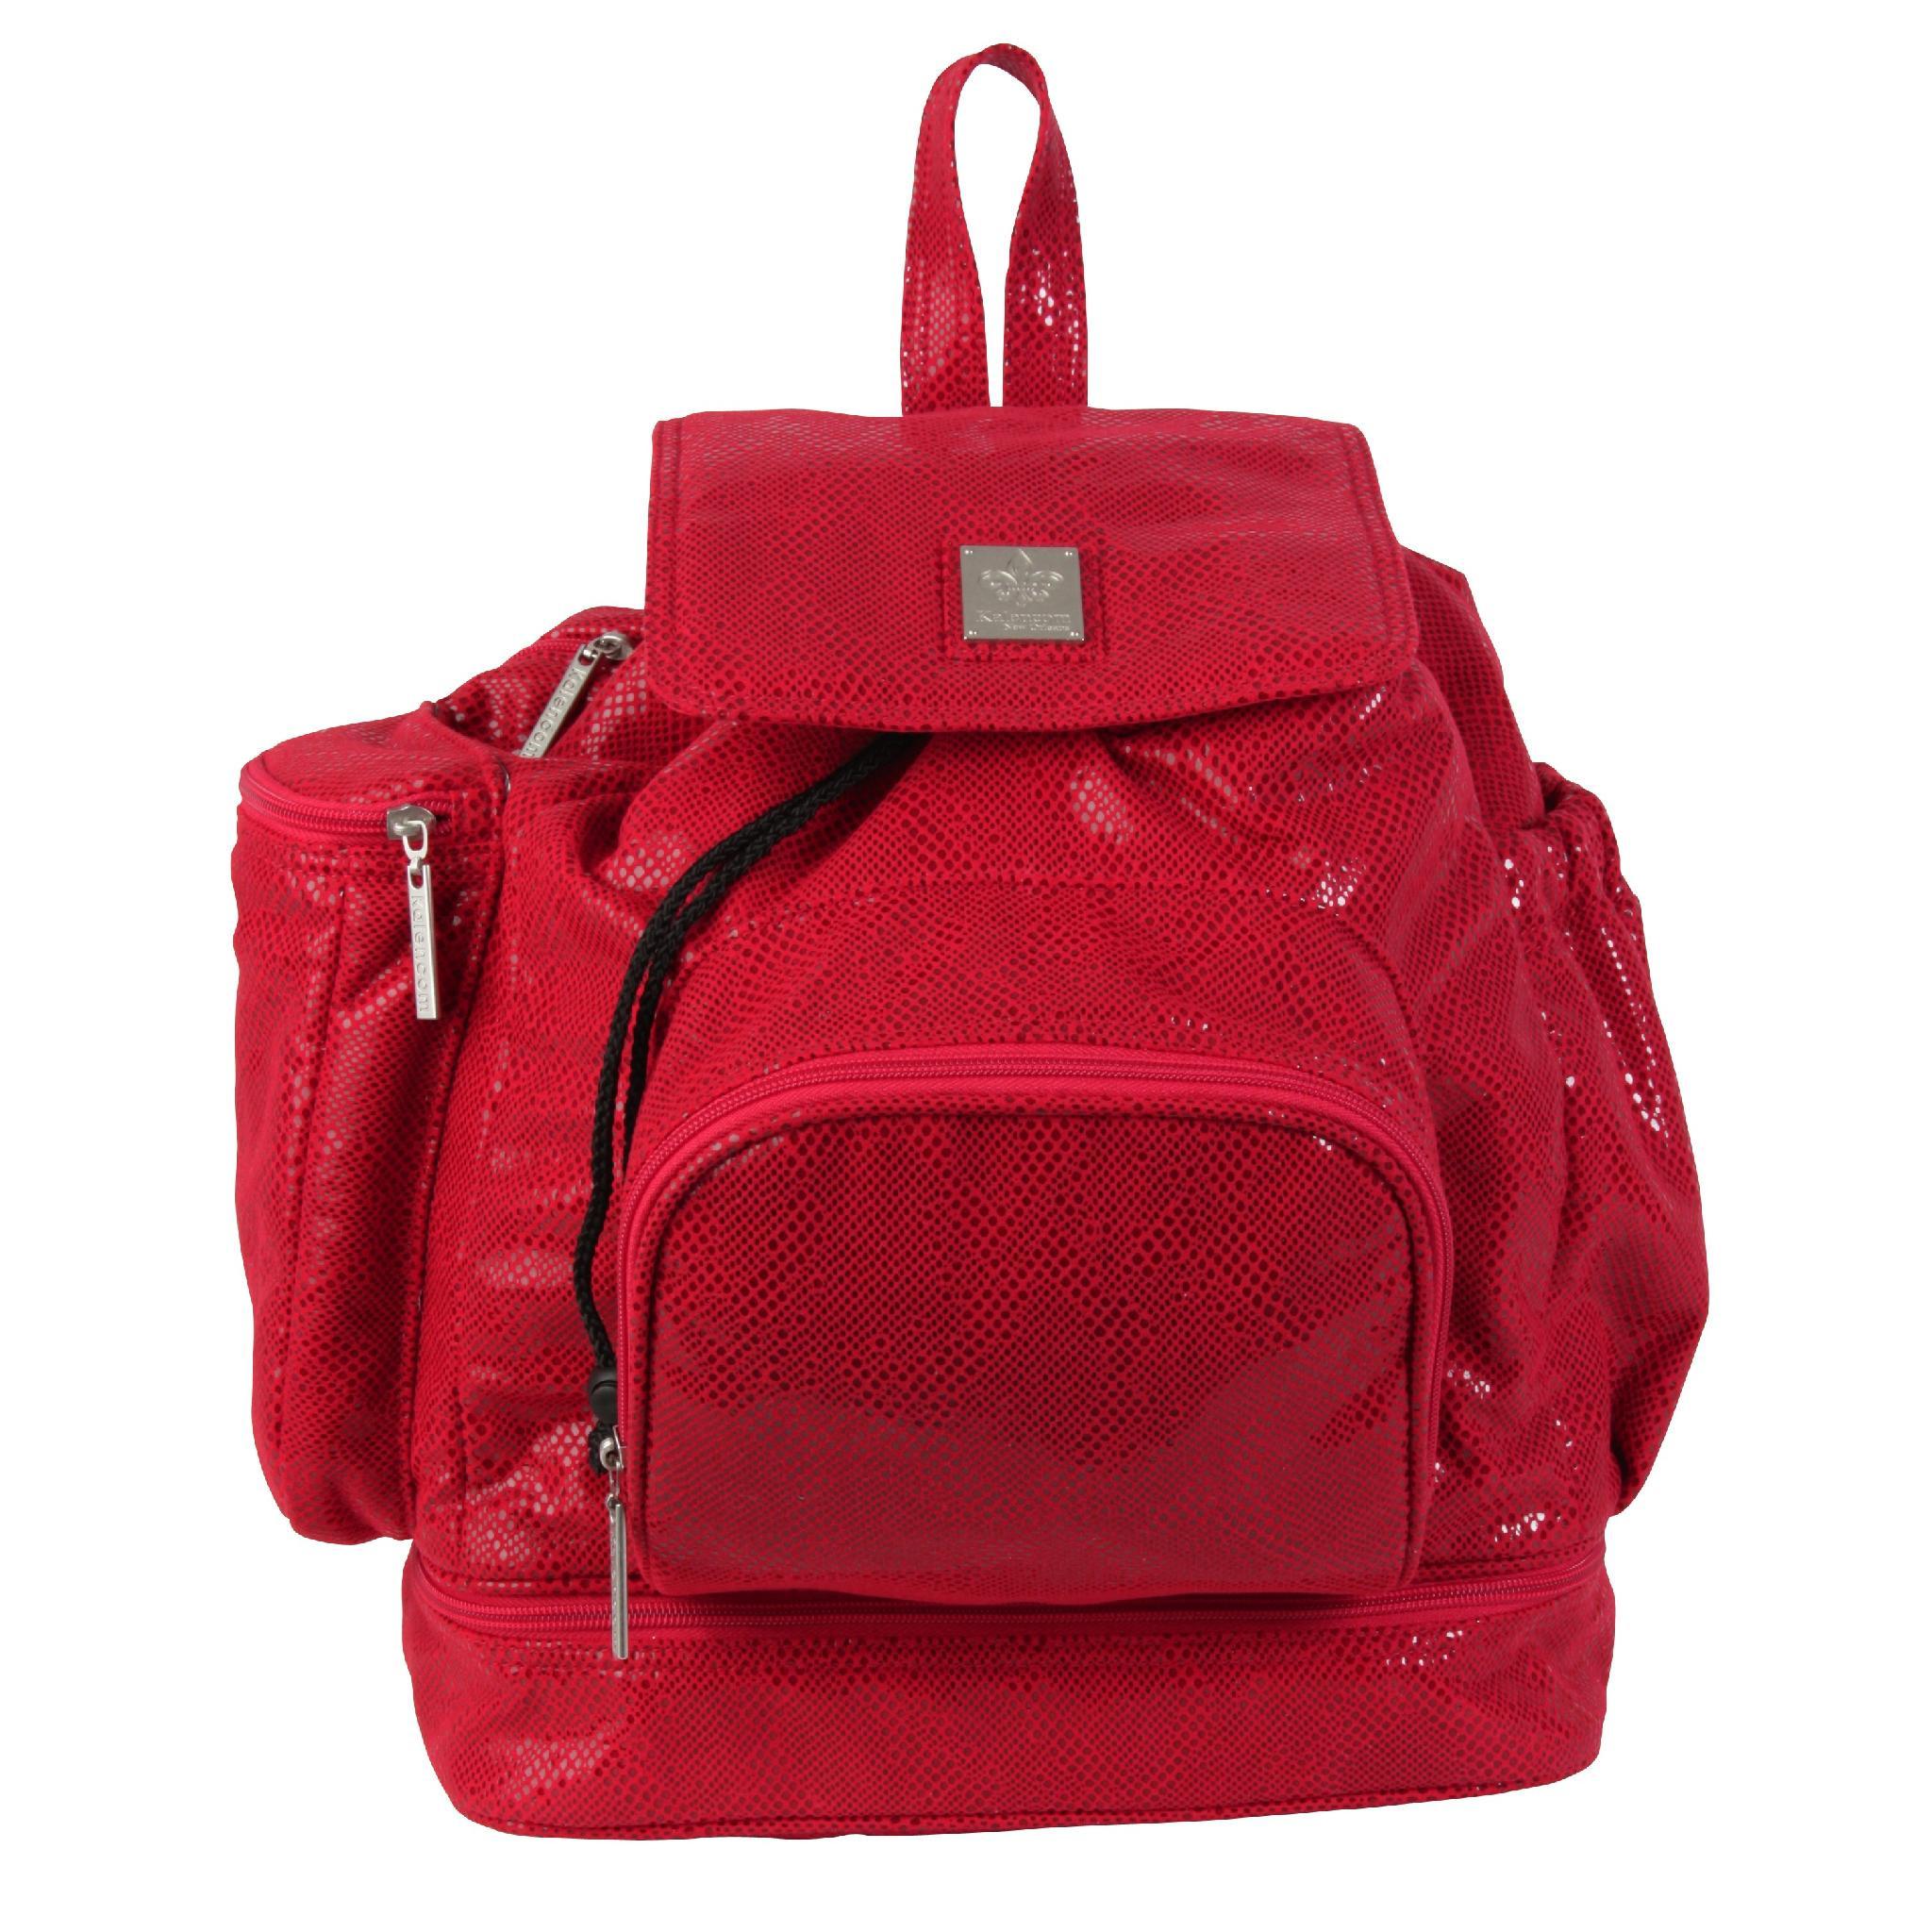 Red Diaper Bag All Fashion Bags